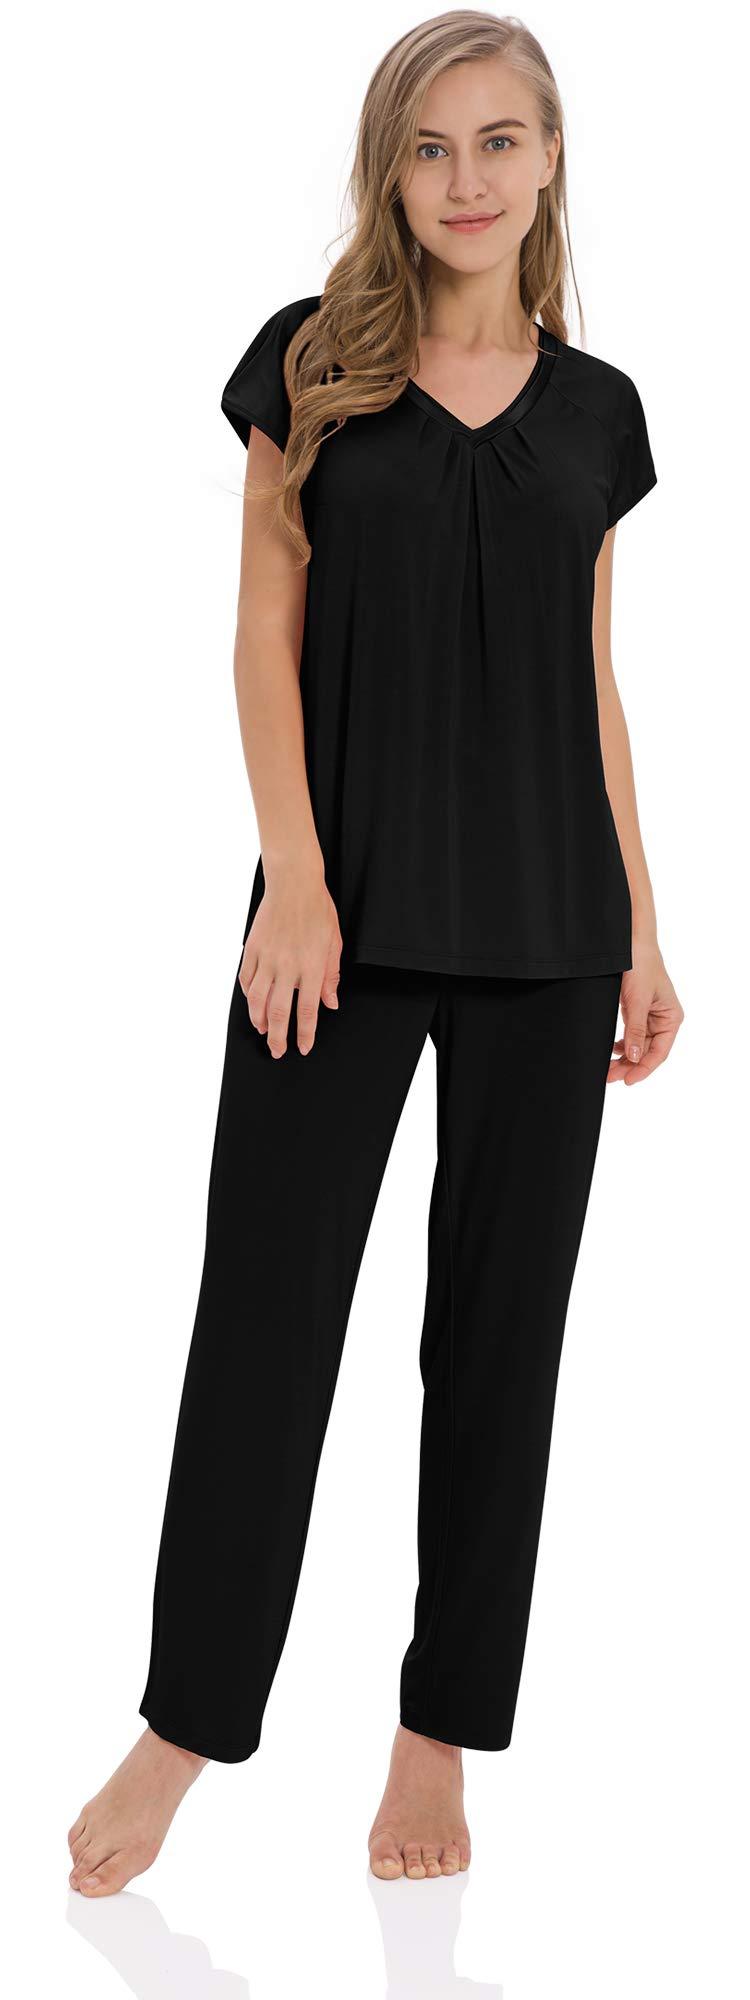 GYS Women's Short Cap Sleeve V Neck Pajama Pants Set